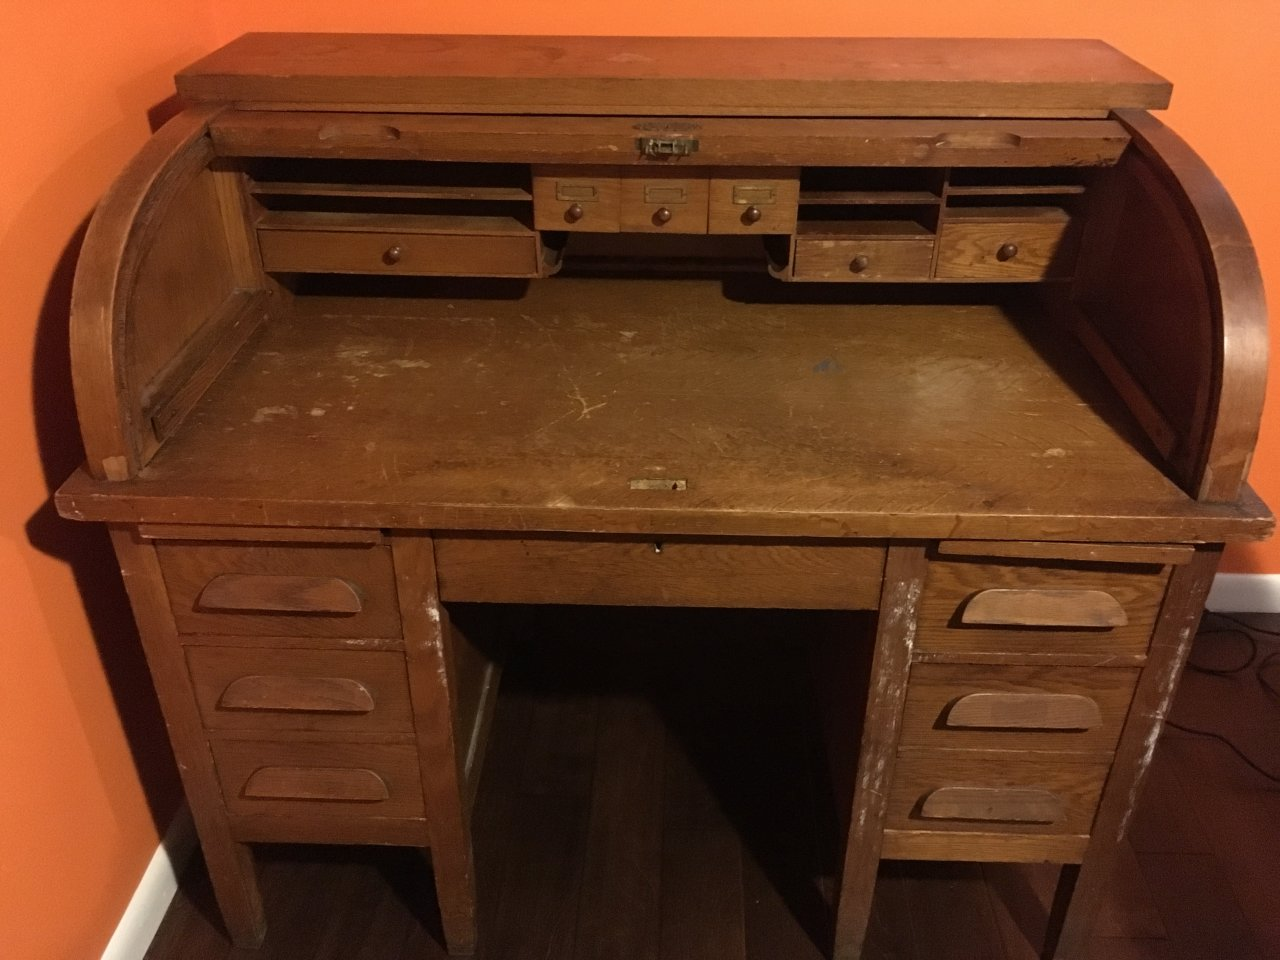 Antique Jasper Rolltop Desk  Identify Age  Worth  My